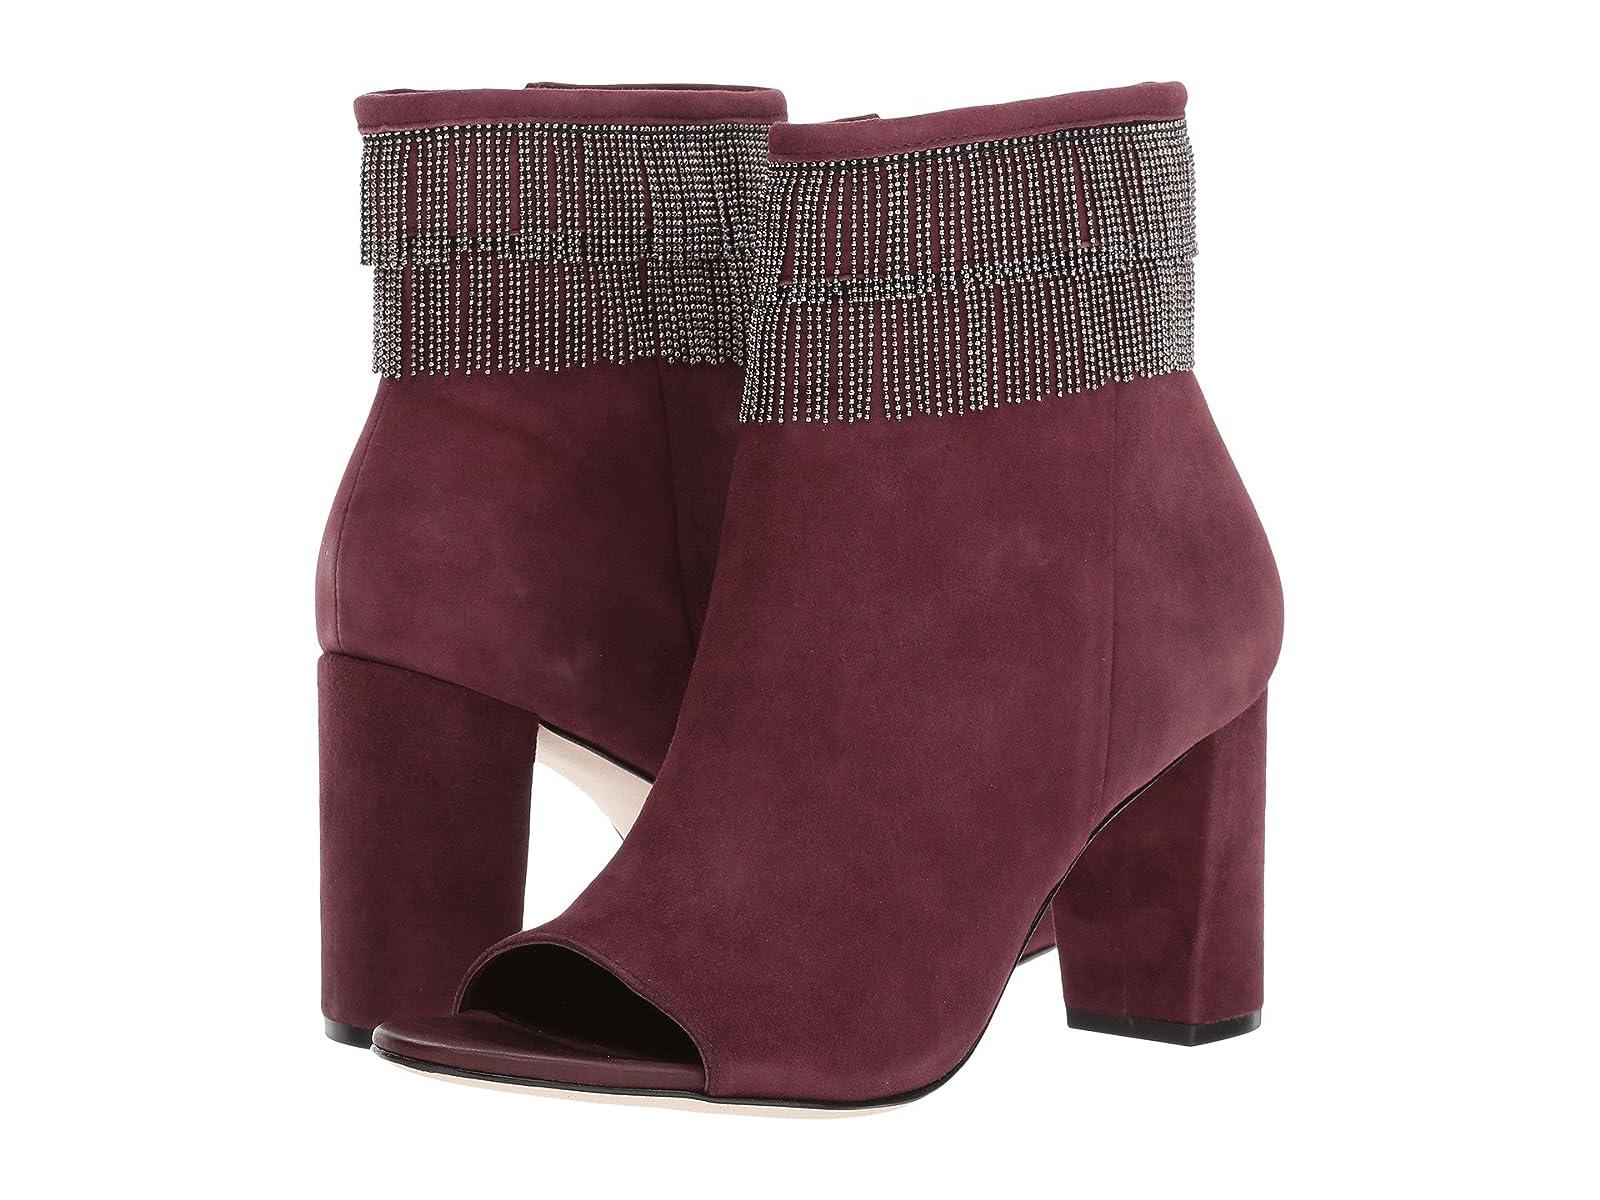 Bernardo HonourCheap and distinctive eye-catching shoes